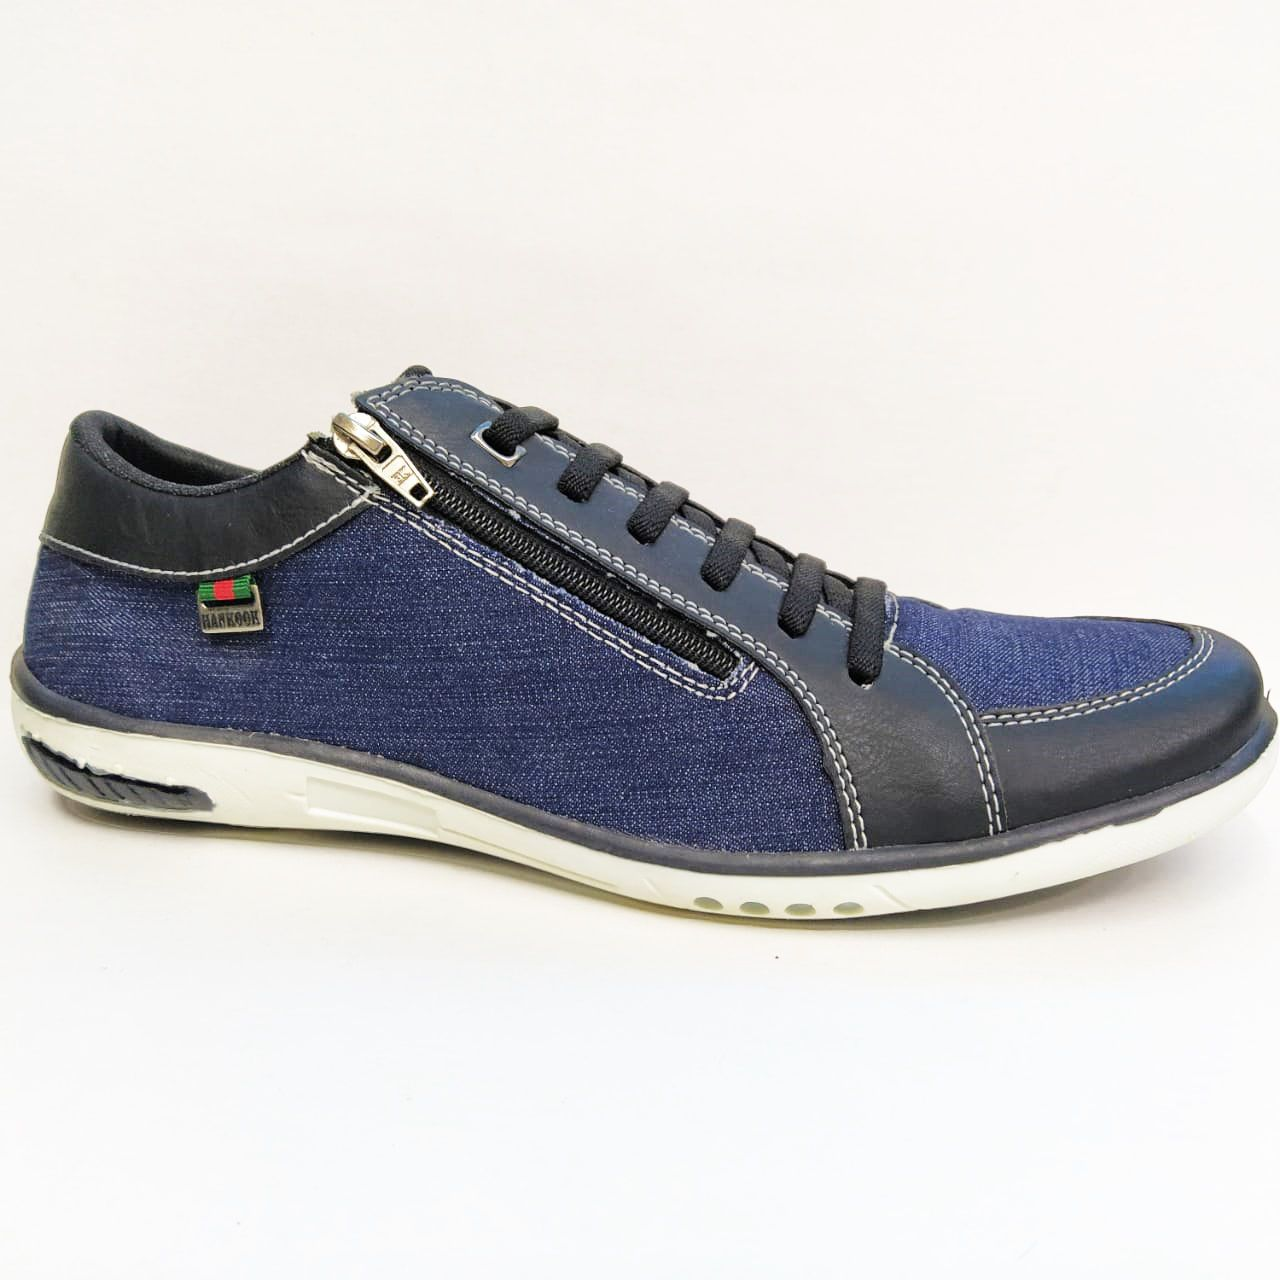 Sapatênis Masculino Hankook 12712 - Jeans / Preto